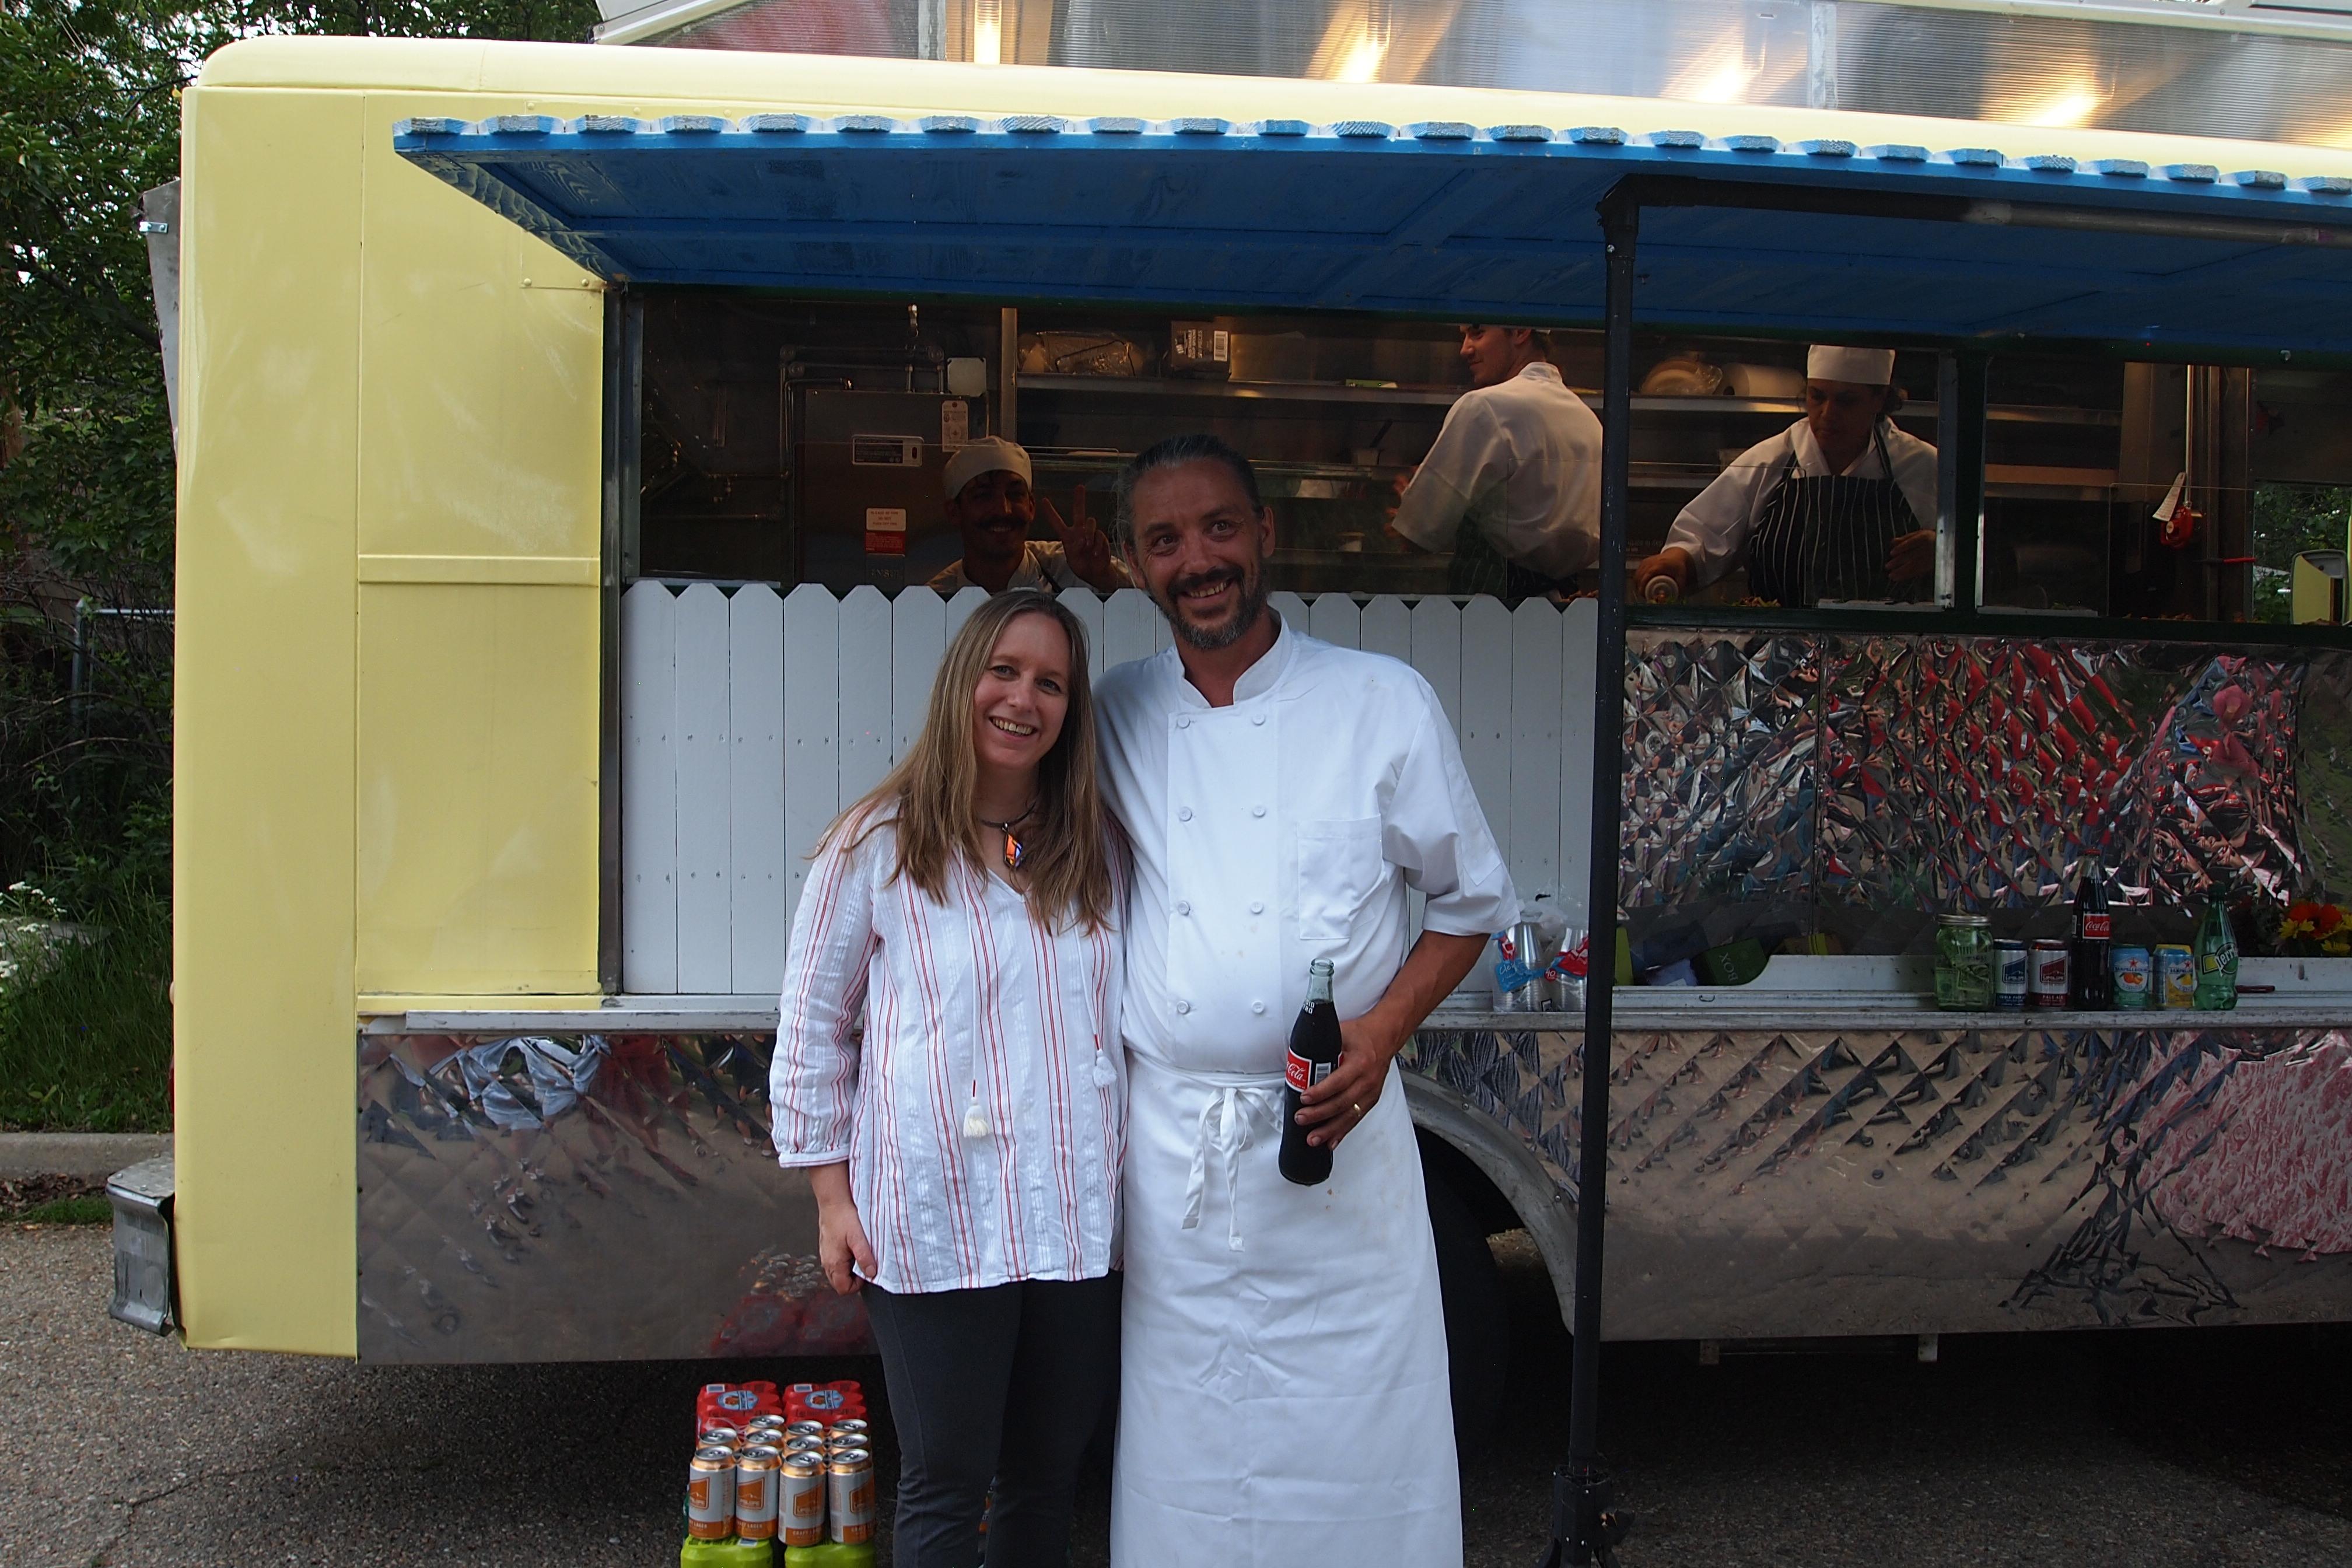 Owners Lori and Michael DeBoer